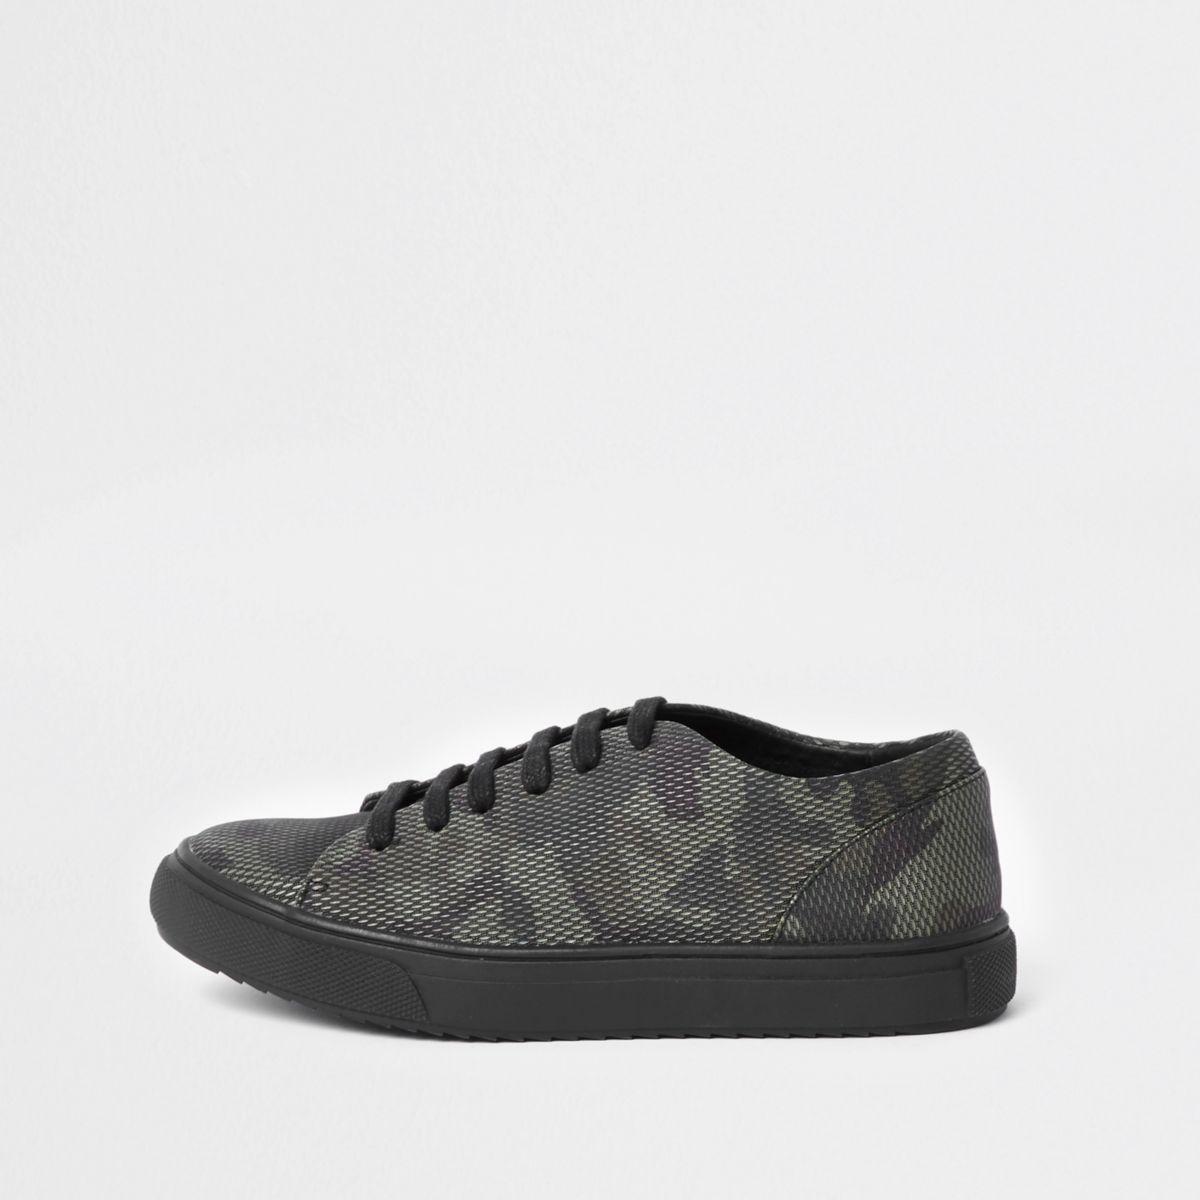 Boys camo lace up sneaker